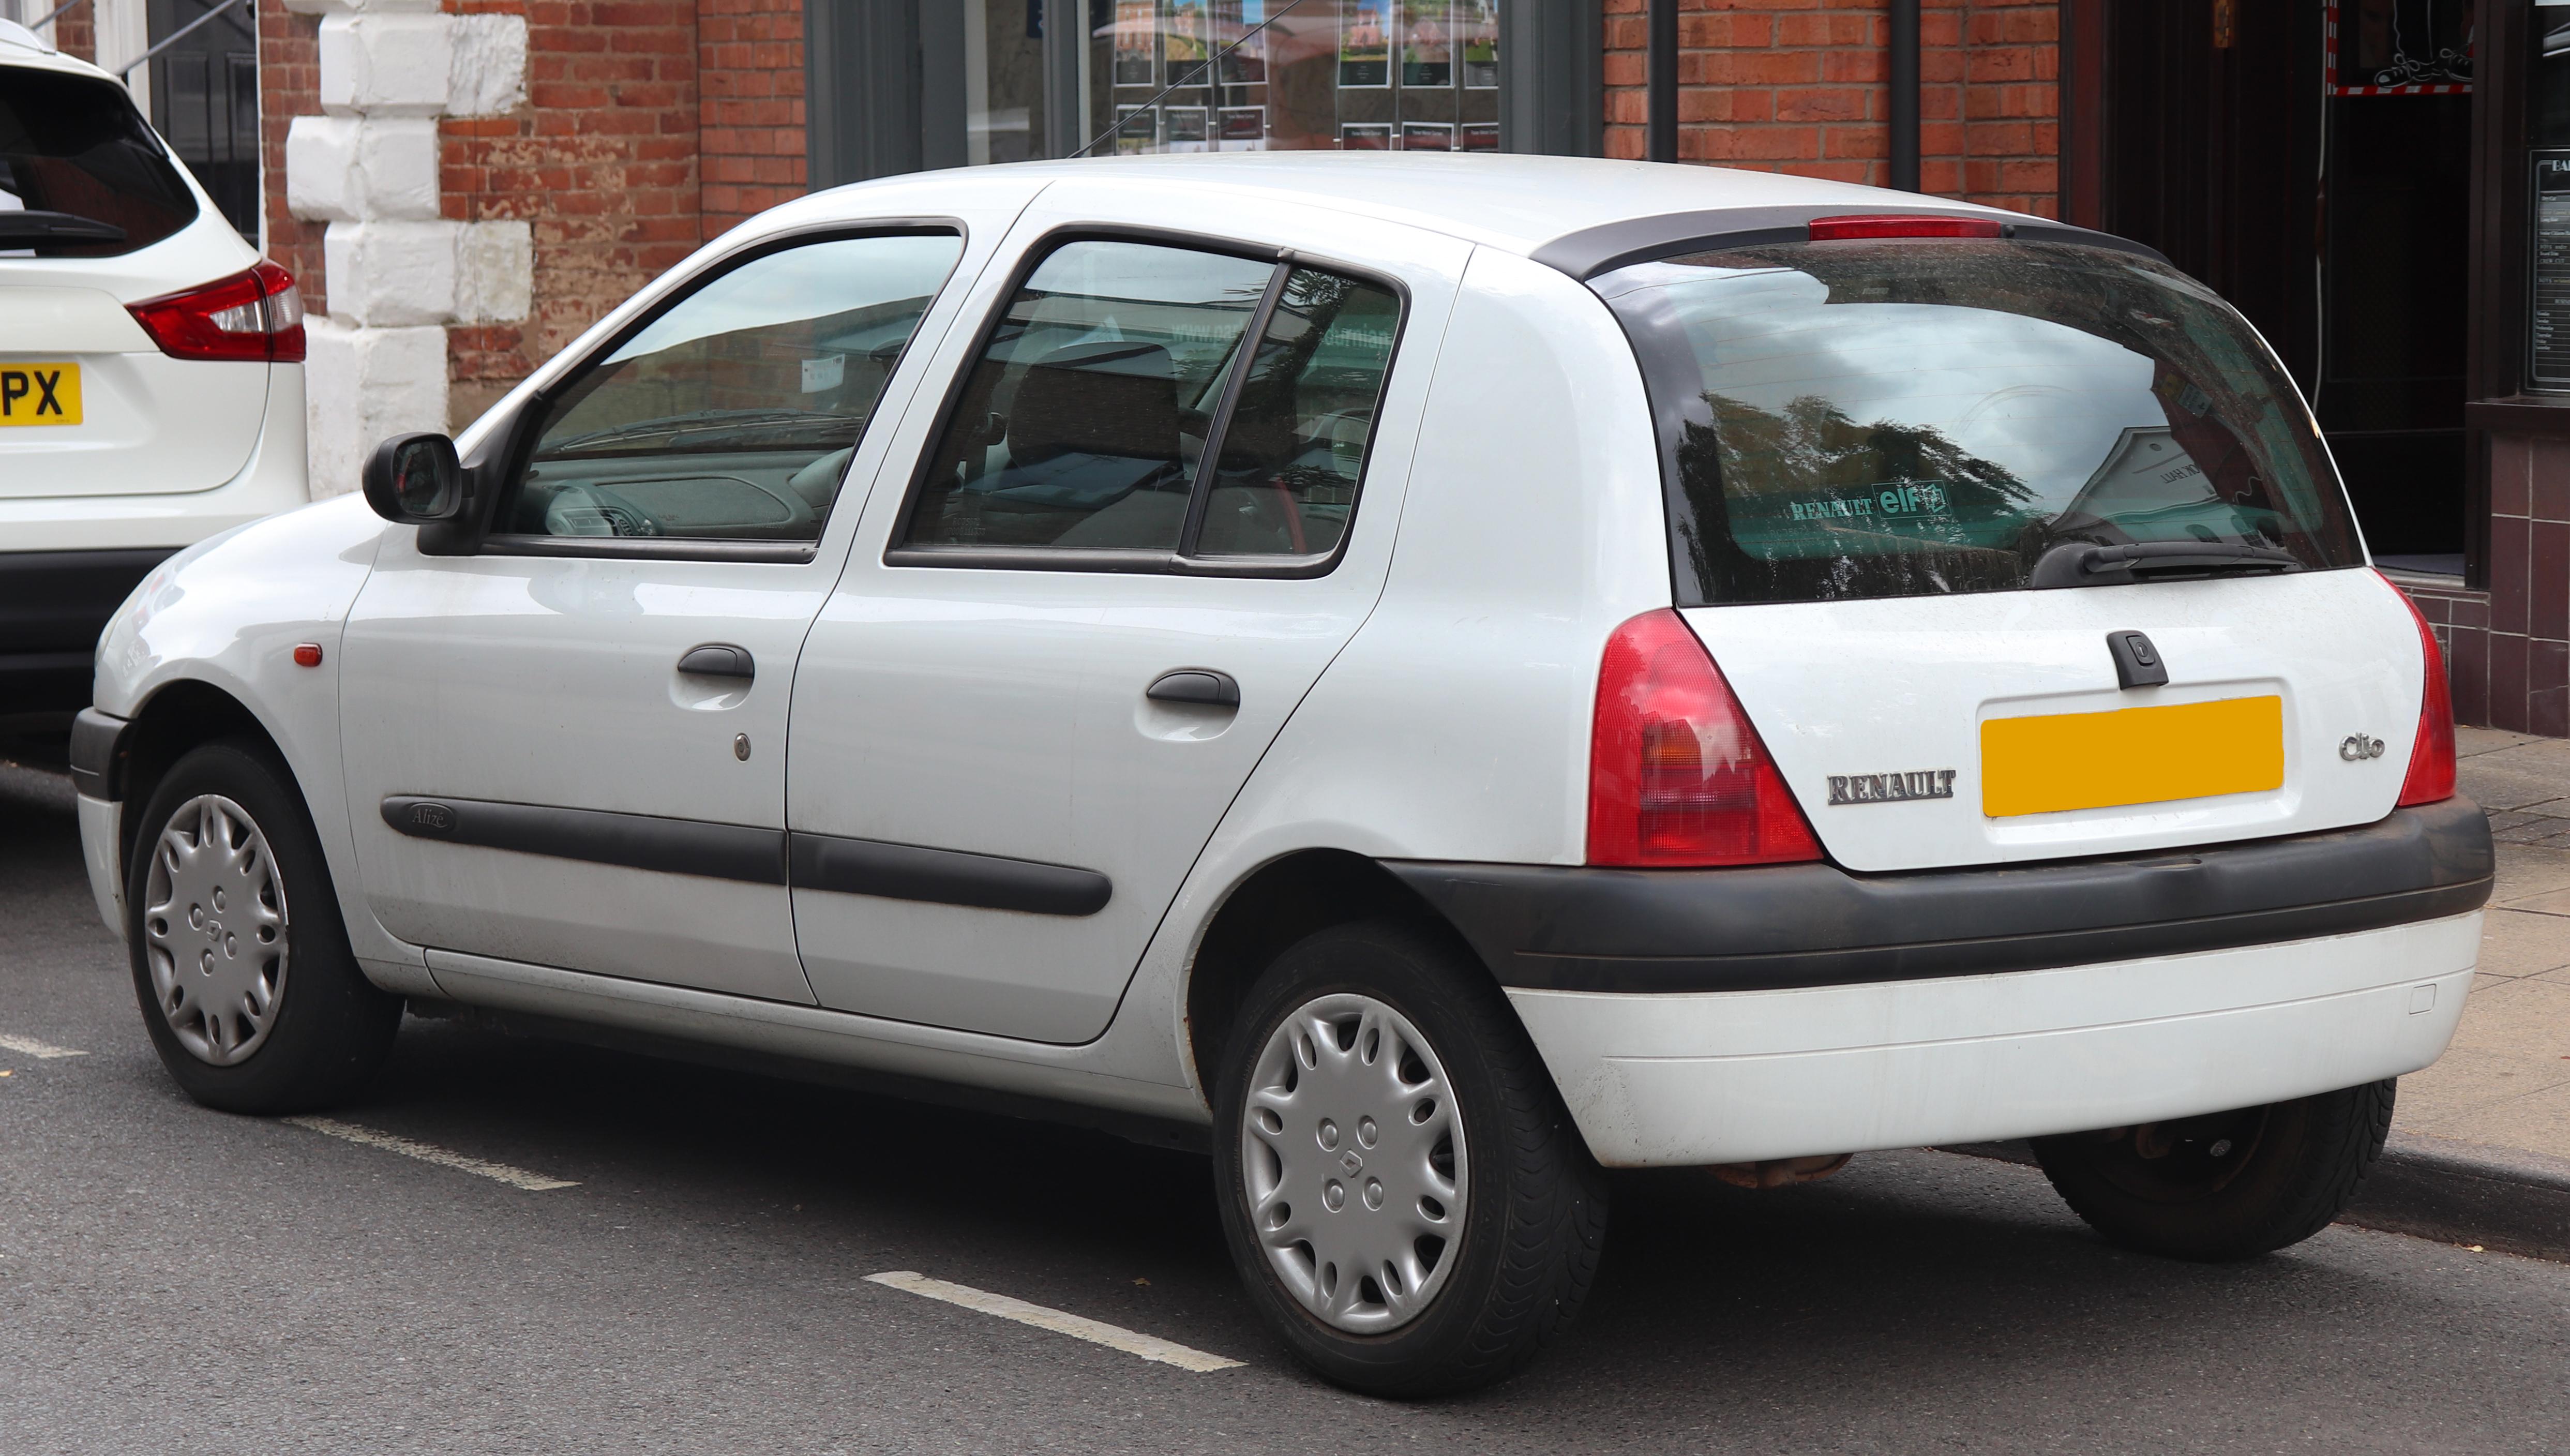 Oryginał File:2001 Renault Clio Alize 1.4 Rear.jpg - Wikimedia Commons QE88